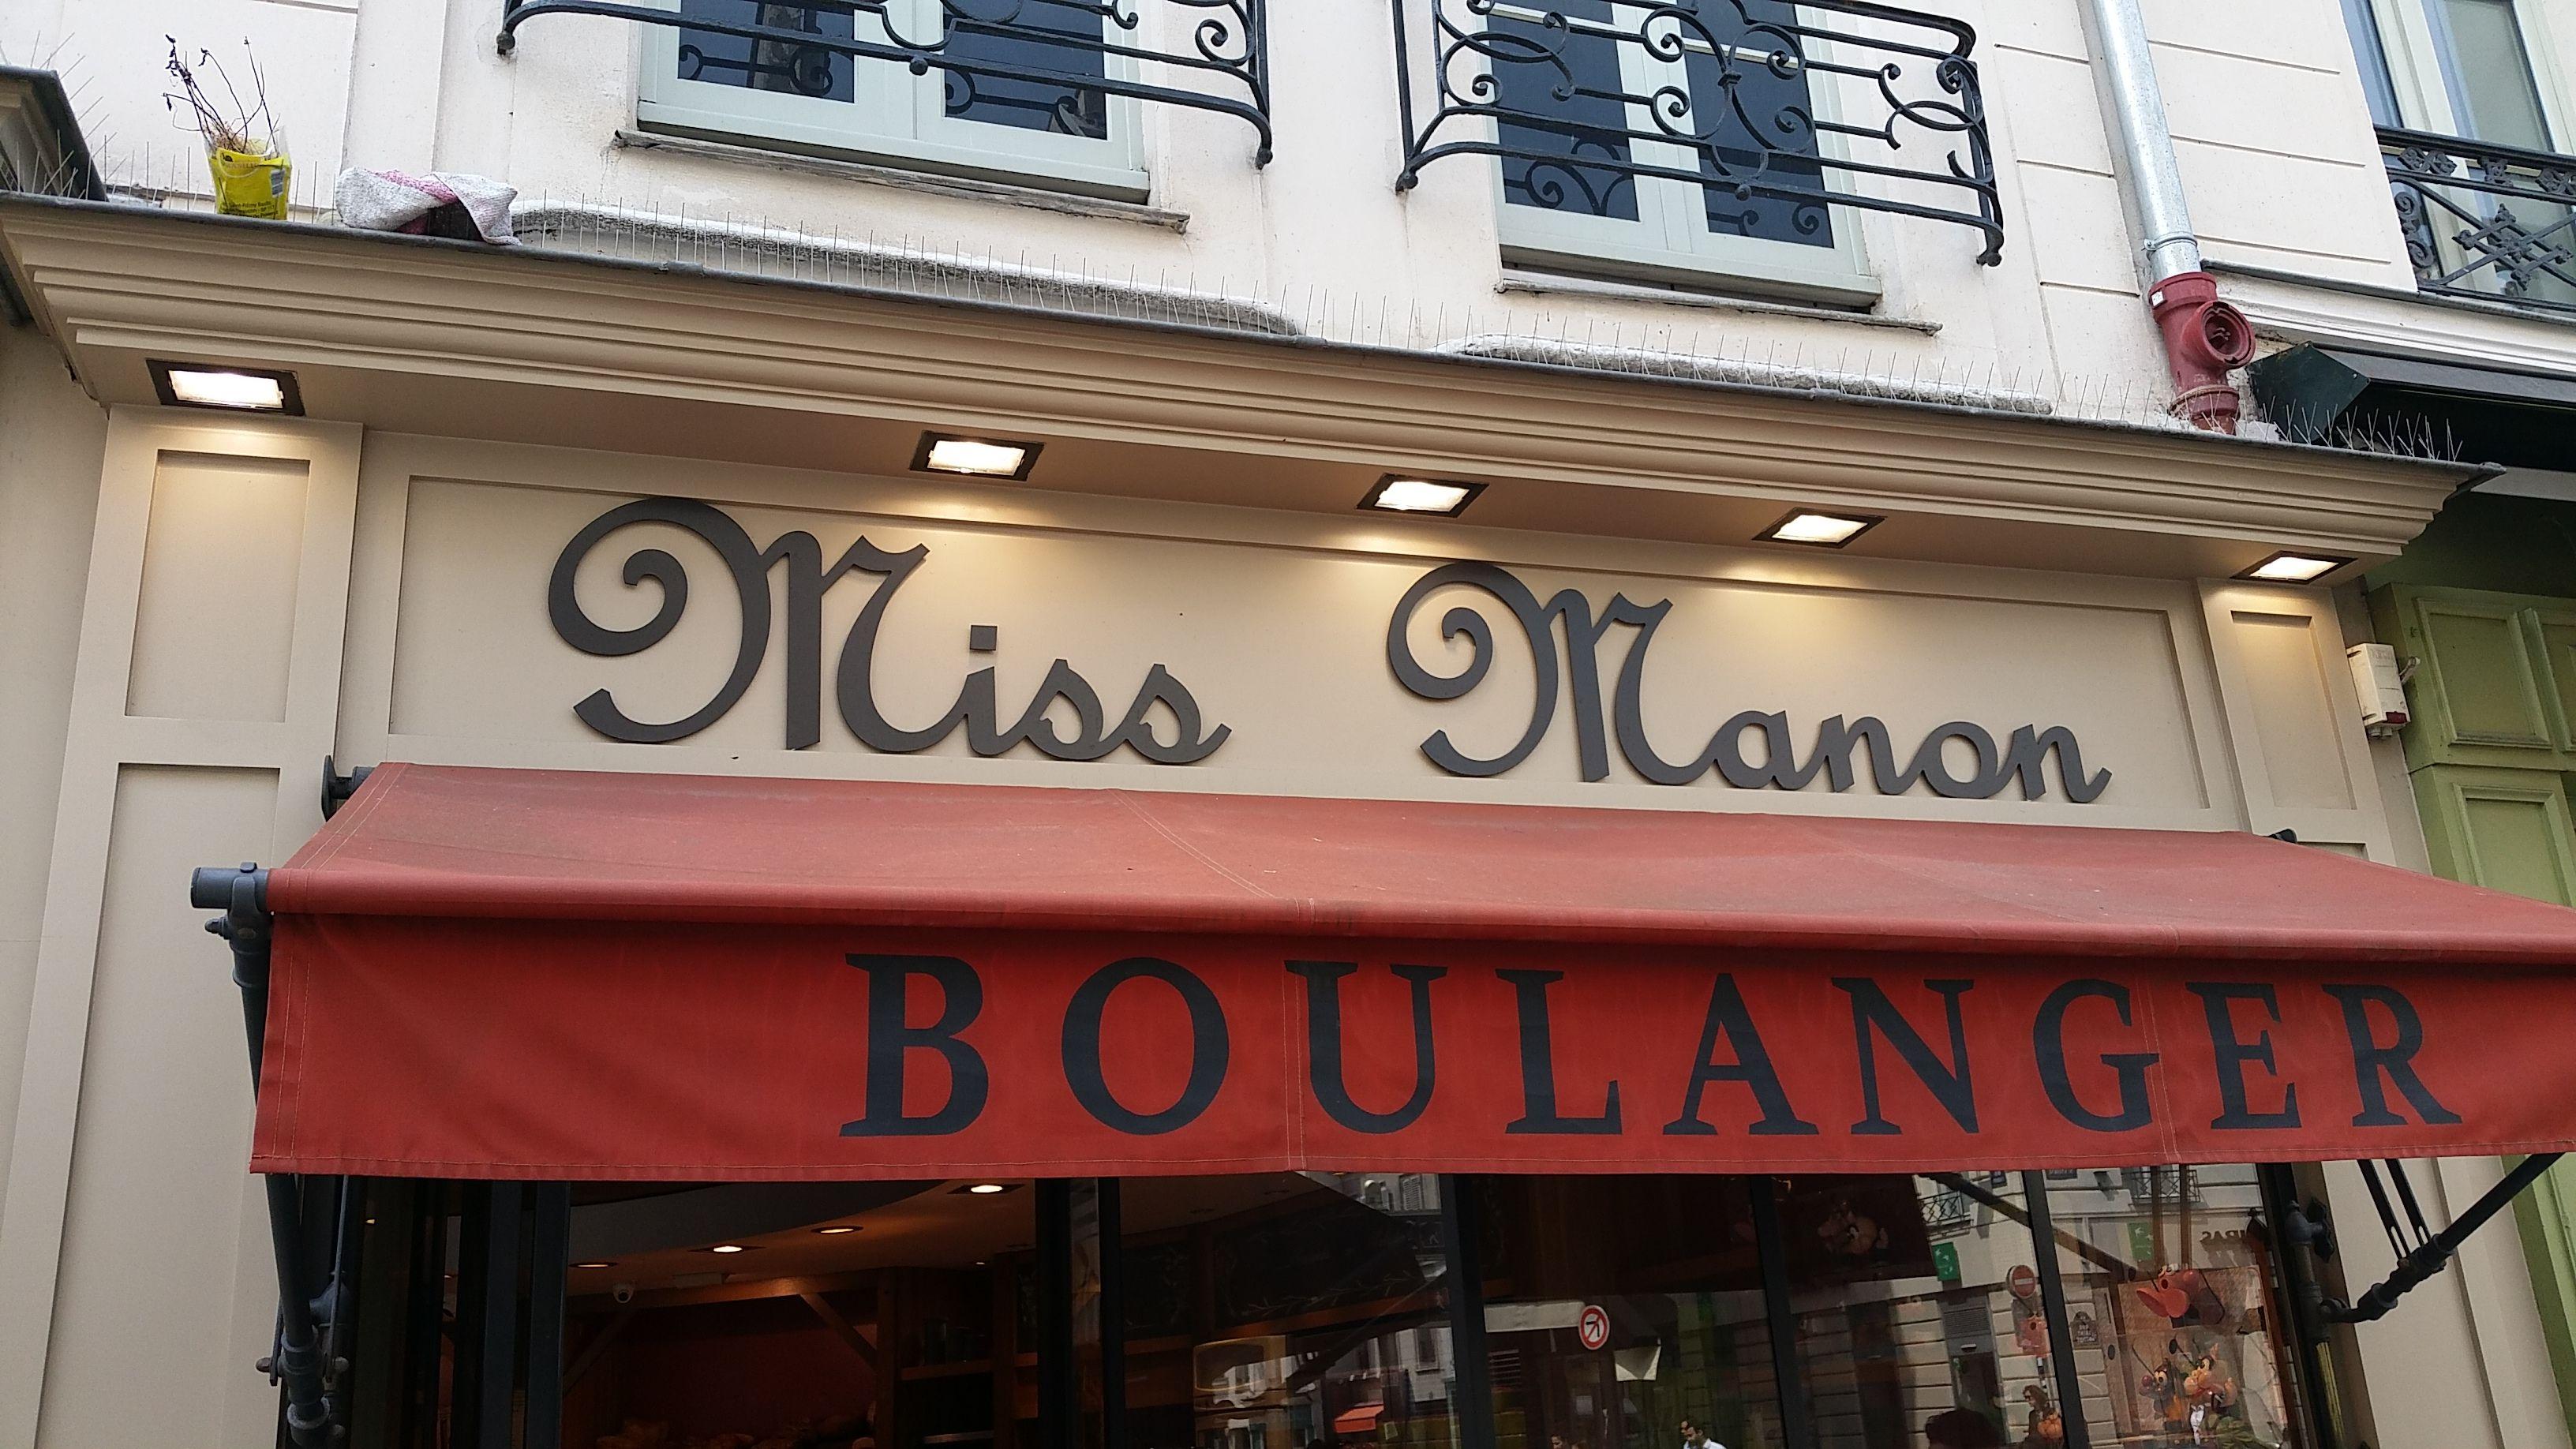 Miss Manon Excellent Backery In Paris Traubenliebe Paris Breakfast Slowfood Traubenliebe Broadway Shows Neon Signs Broadway